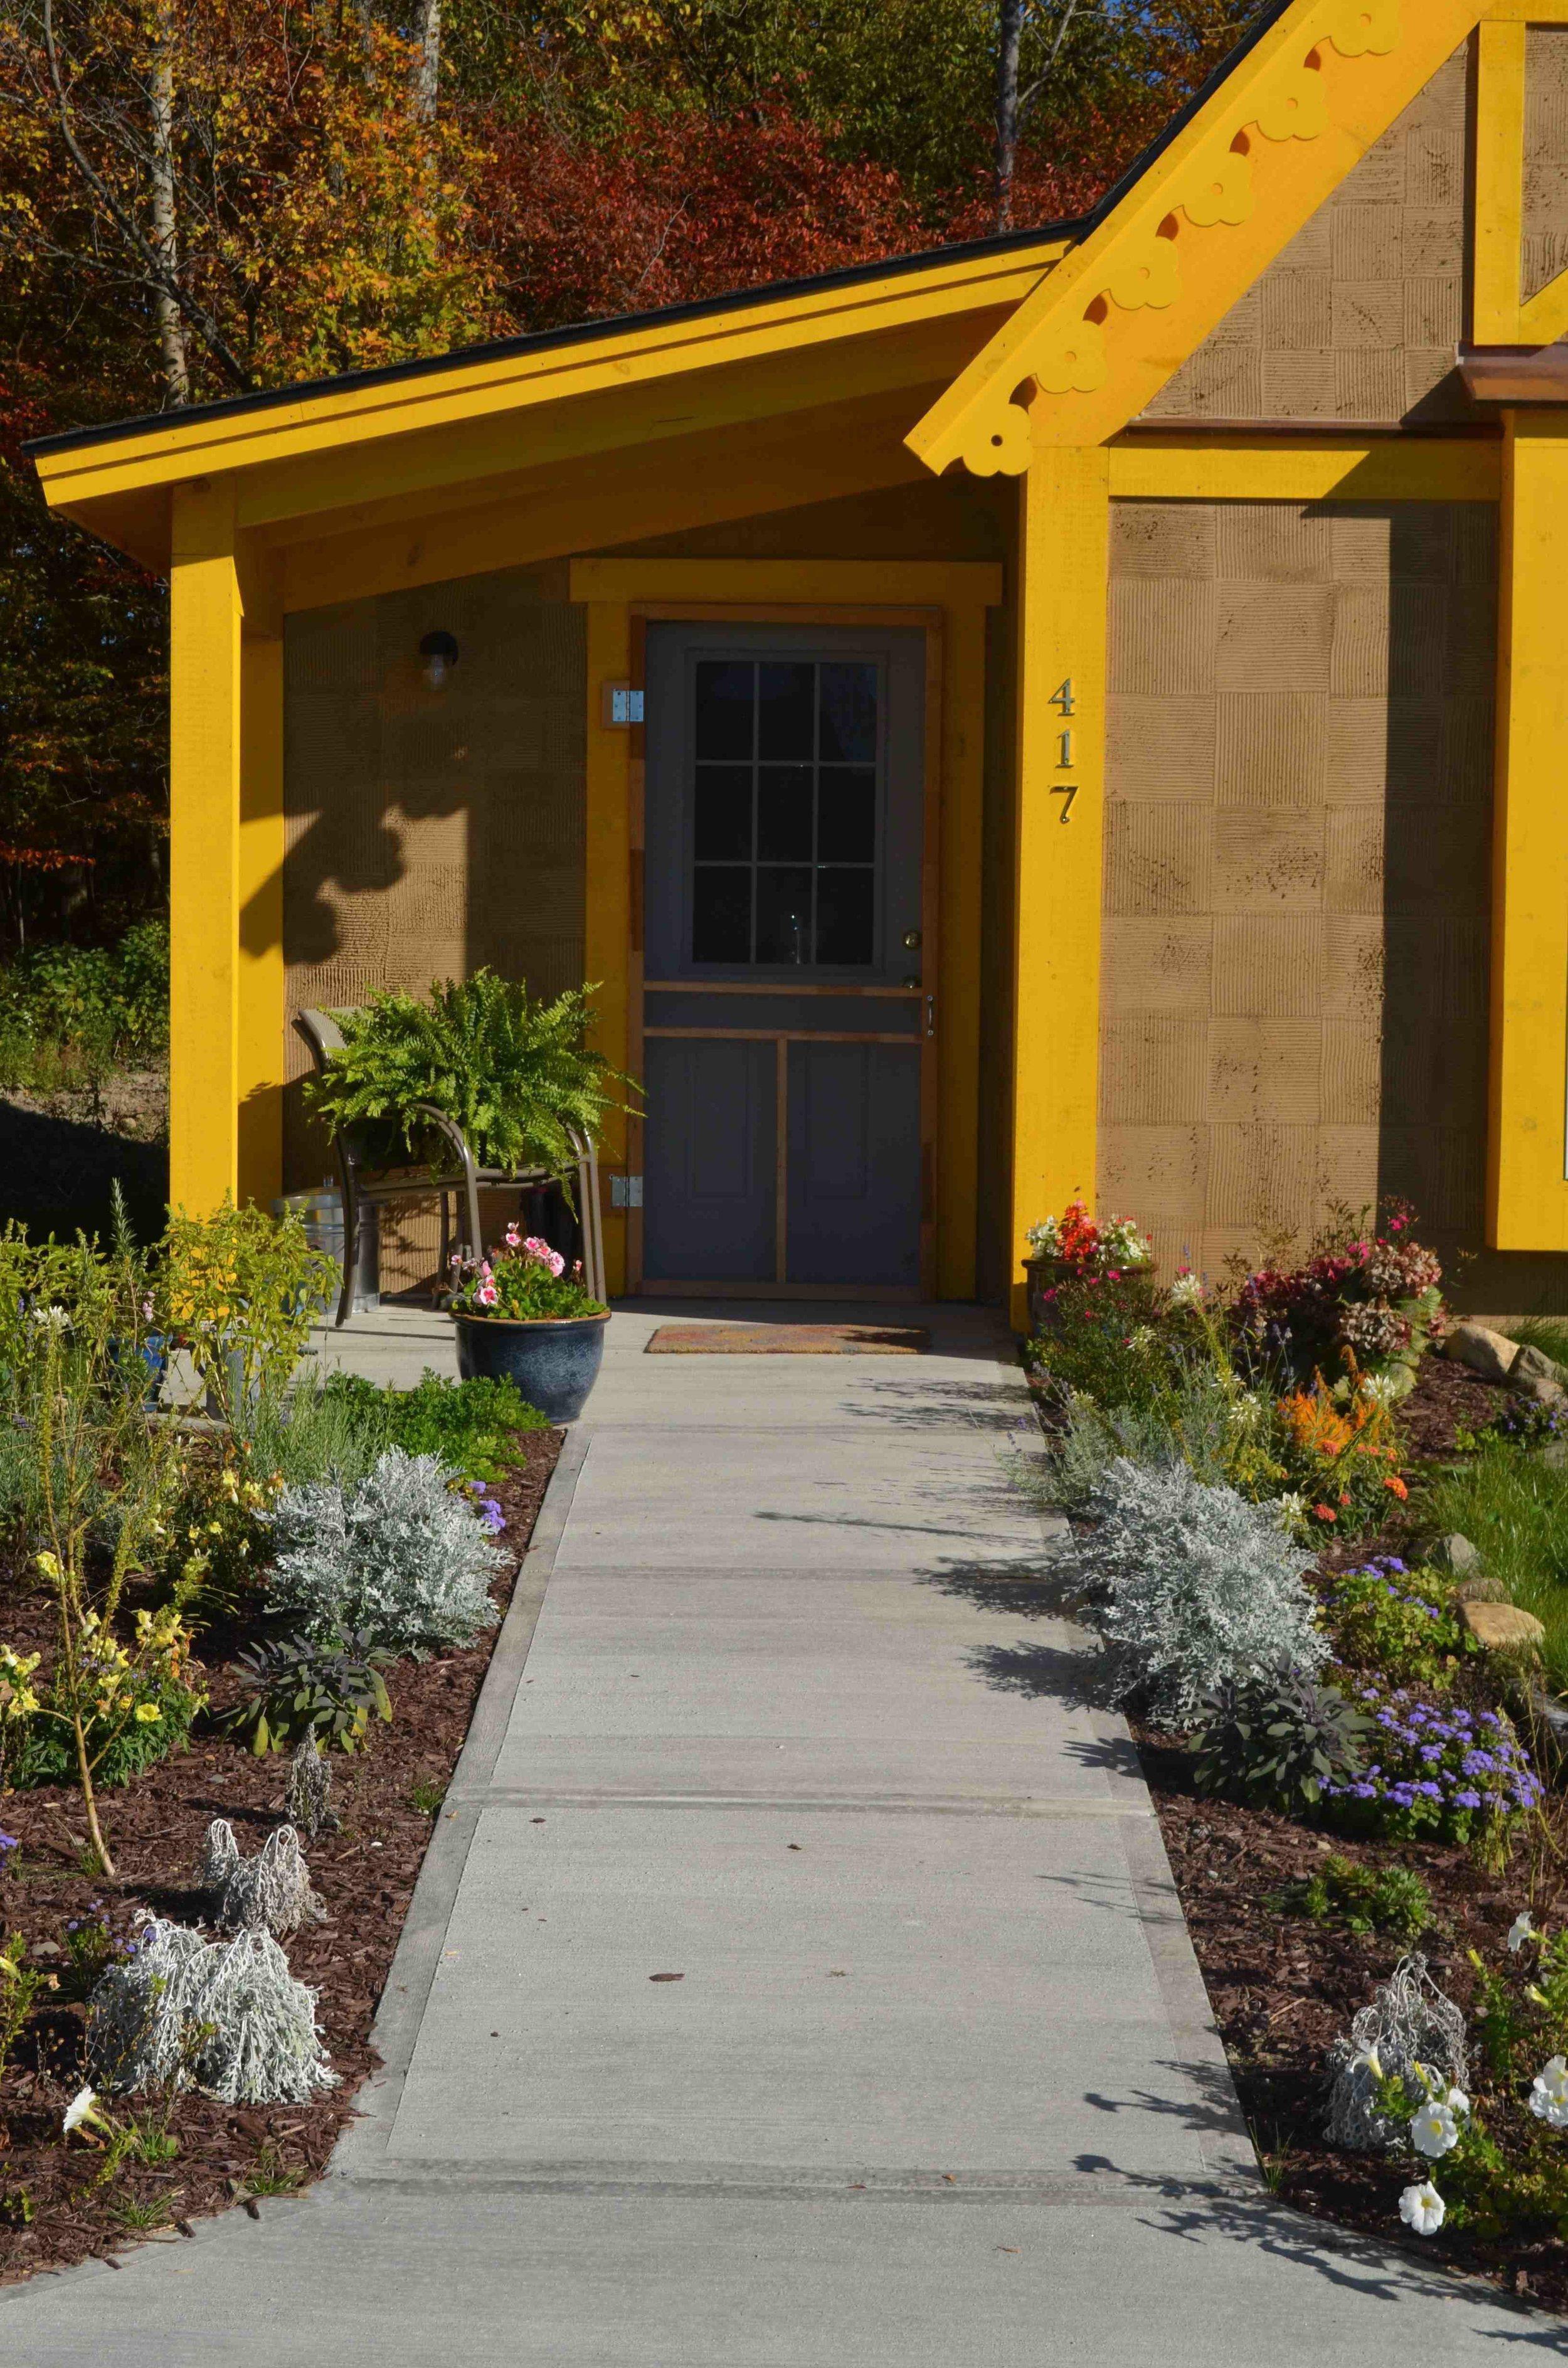 Boiceville-Cottages-Yellow-Apartment.jpg